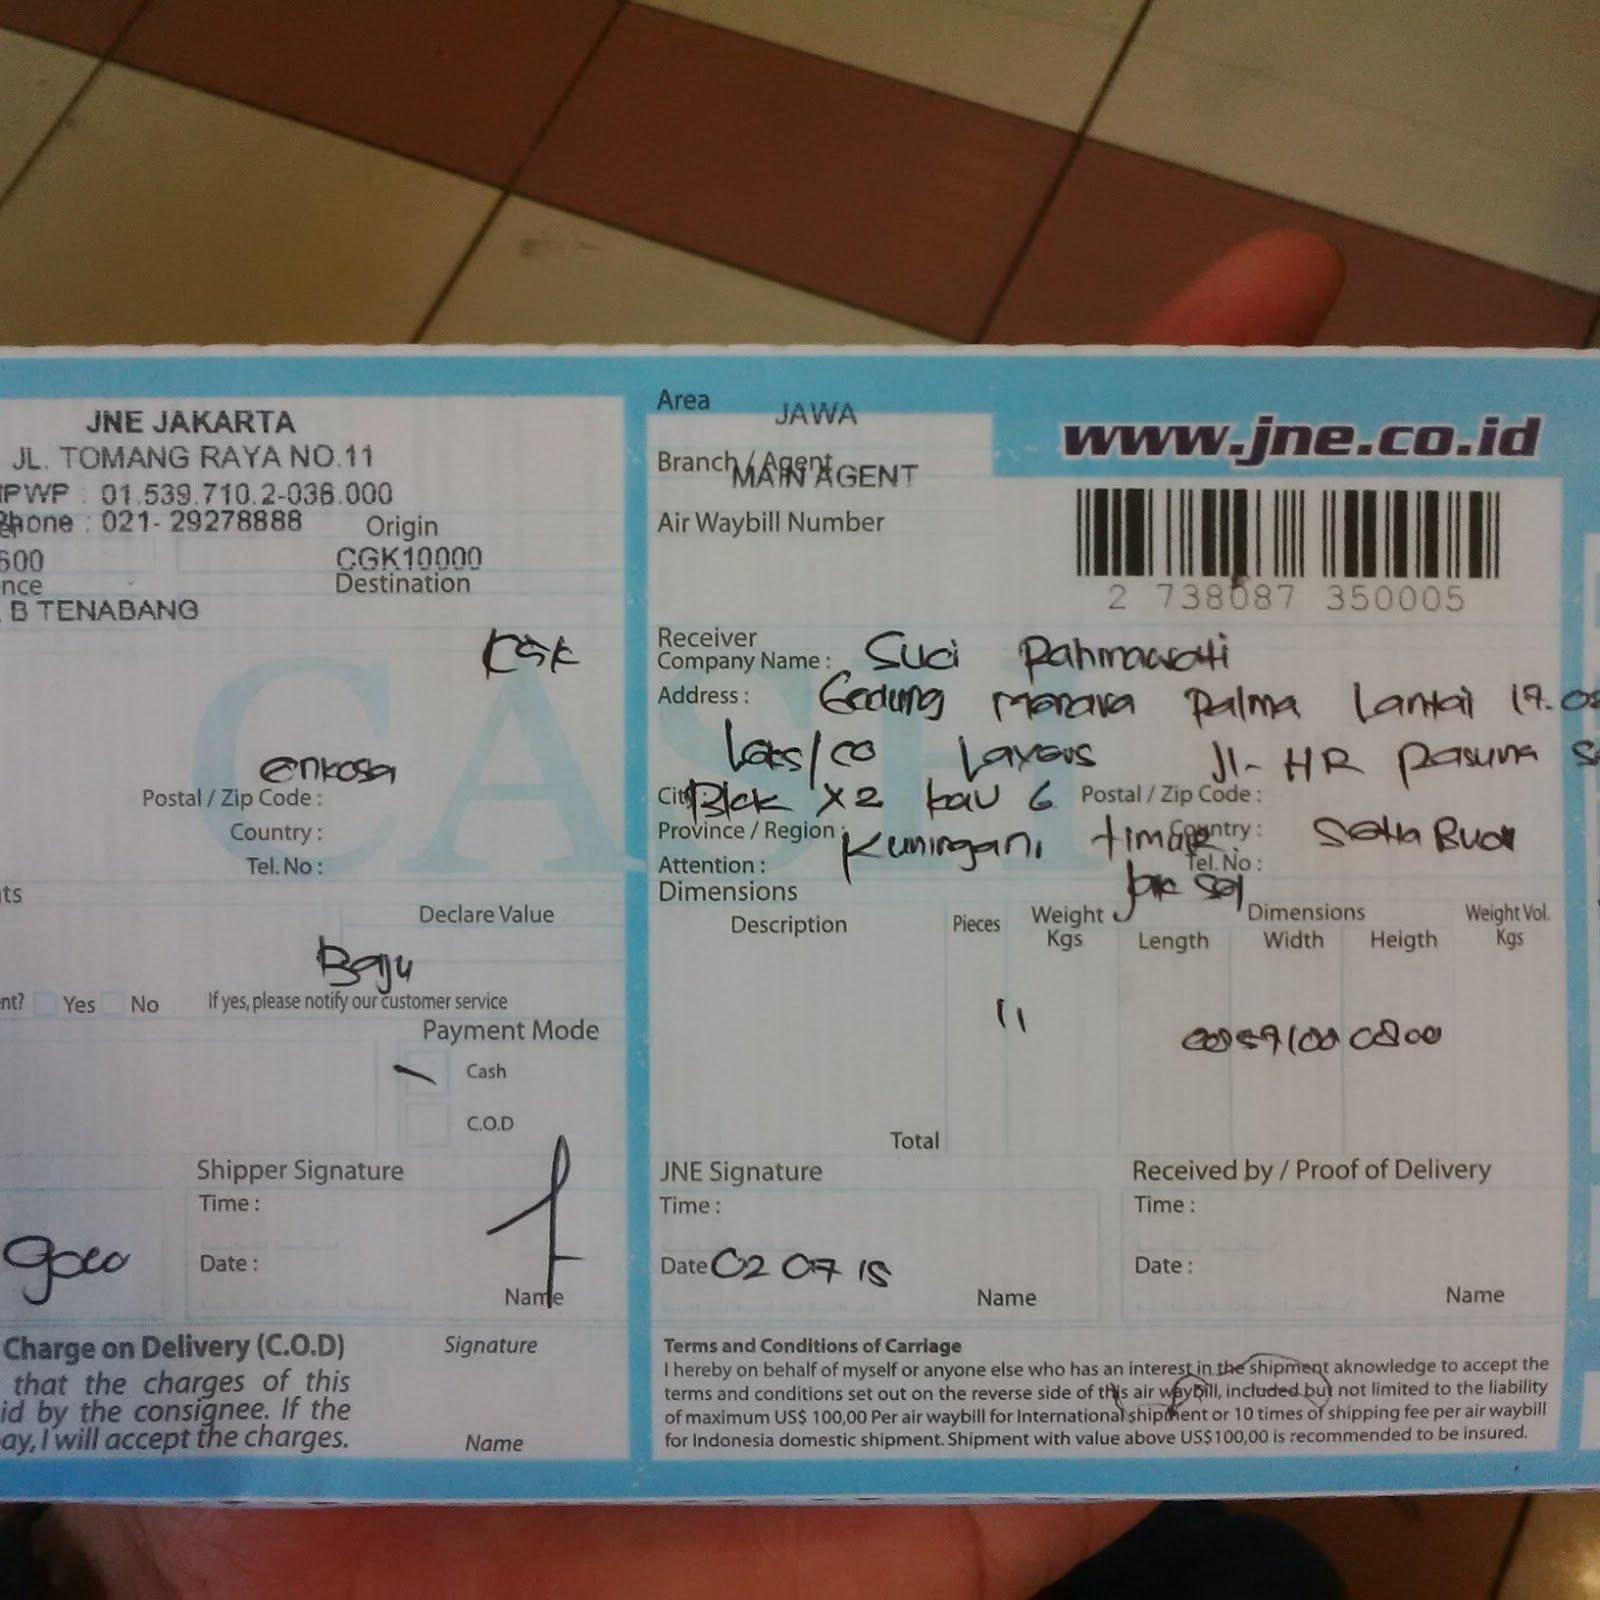 Nomer Resi Suci Rahmawati Gedung Menara Palma Lantai 17 02B Leks&Co Lawyers Jl Hr Rasuna Said Blok X 2 Kav 6 Kuningan Timur Setiabudi Jakarta Selatan